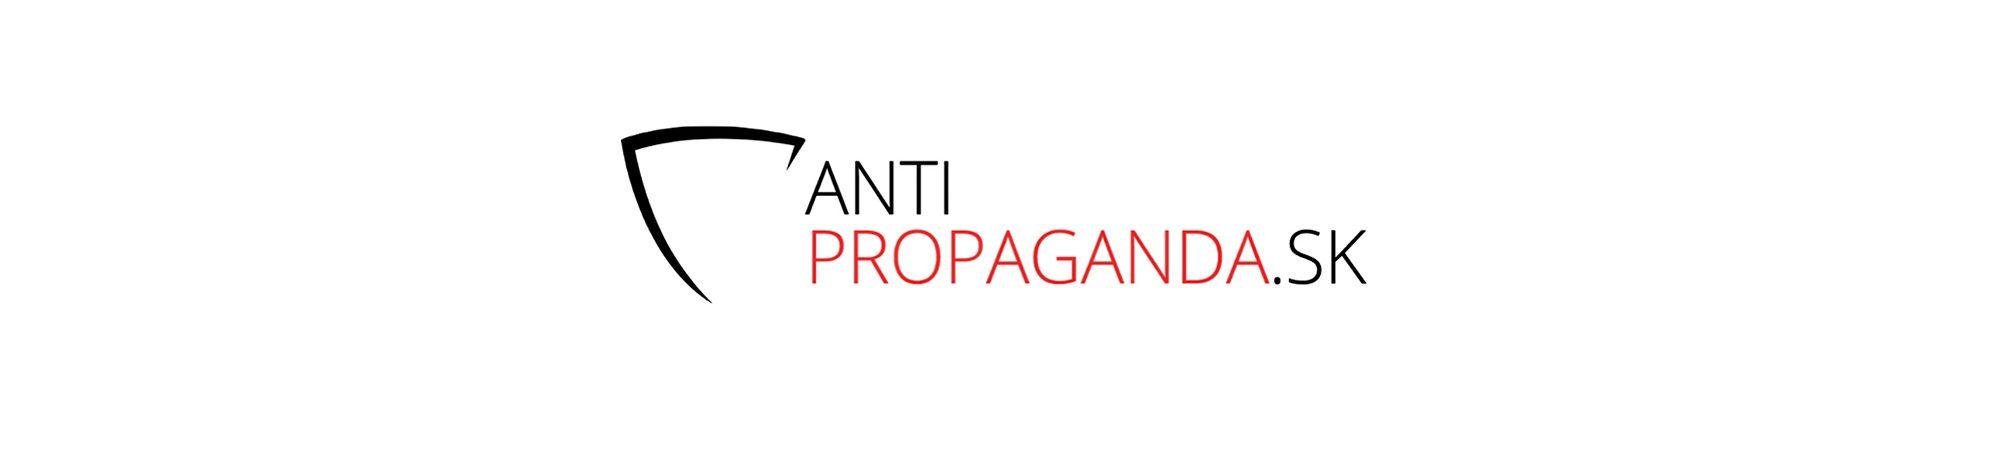 Antipropaganda.sk